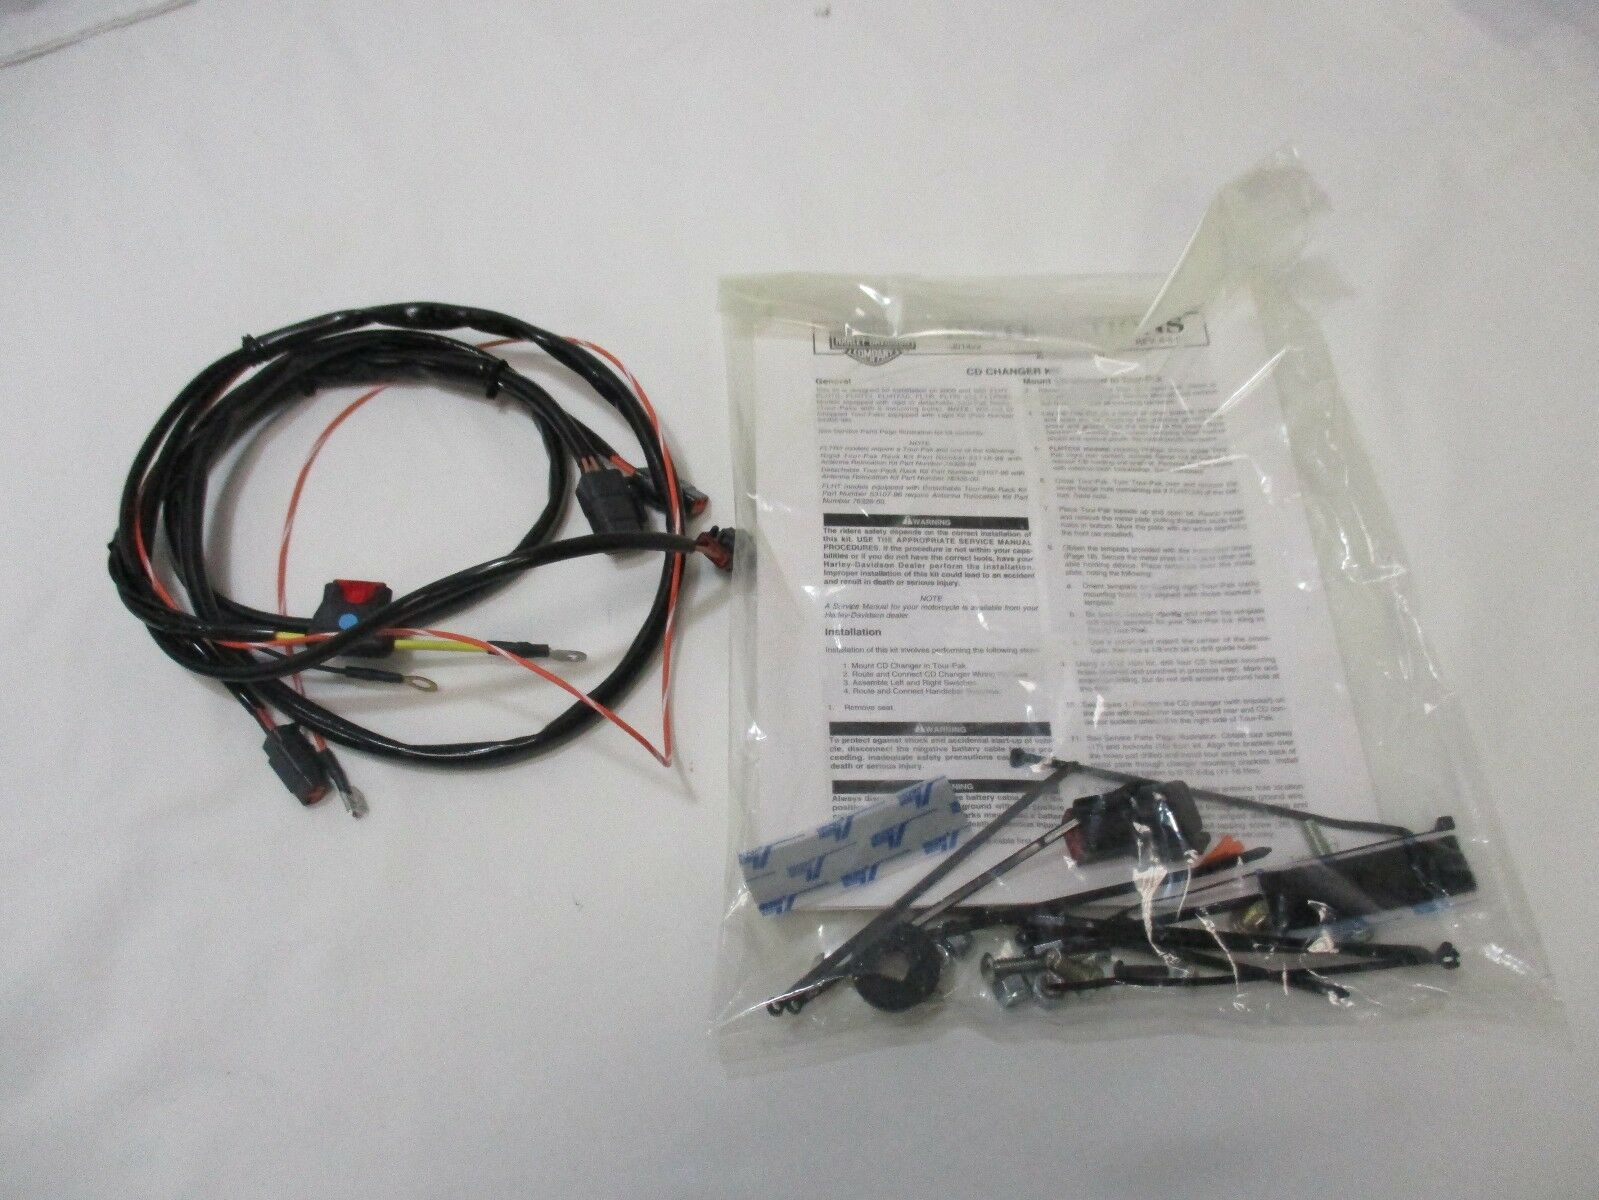 Harley Davidson 12 Cd Changer Kit 77184 01 Ebay Wiring Connectors